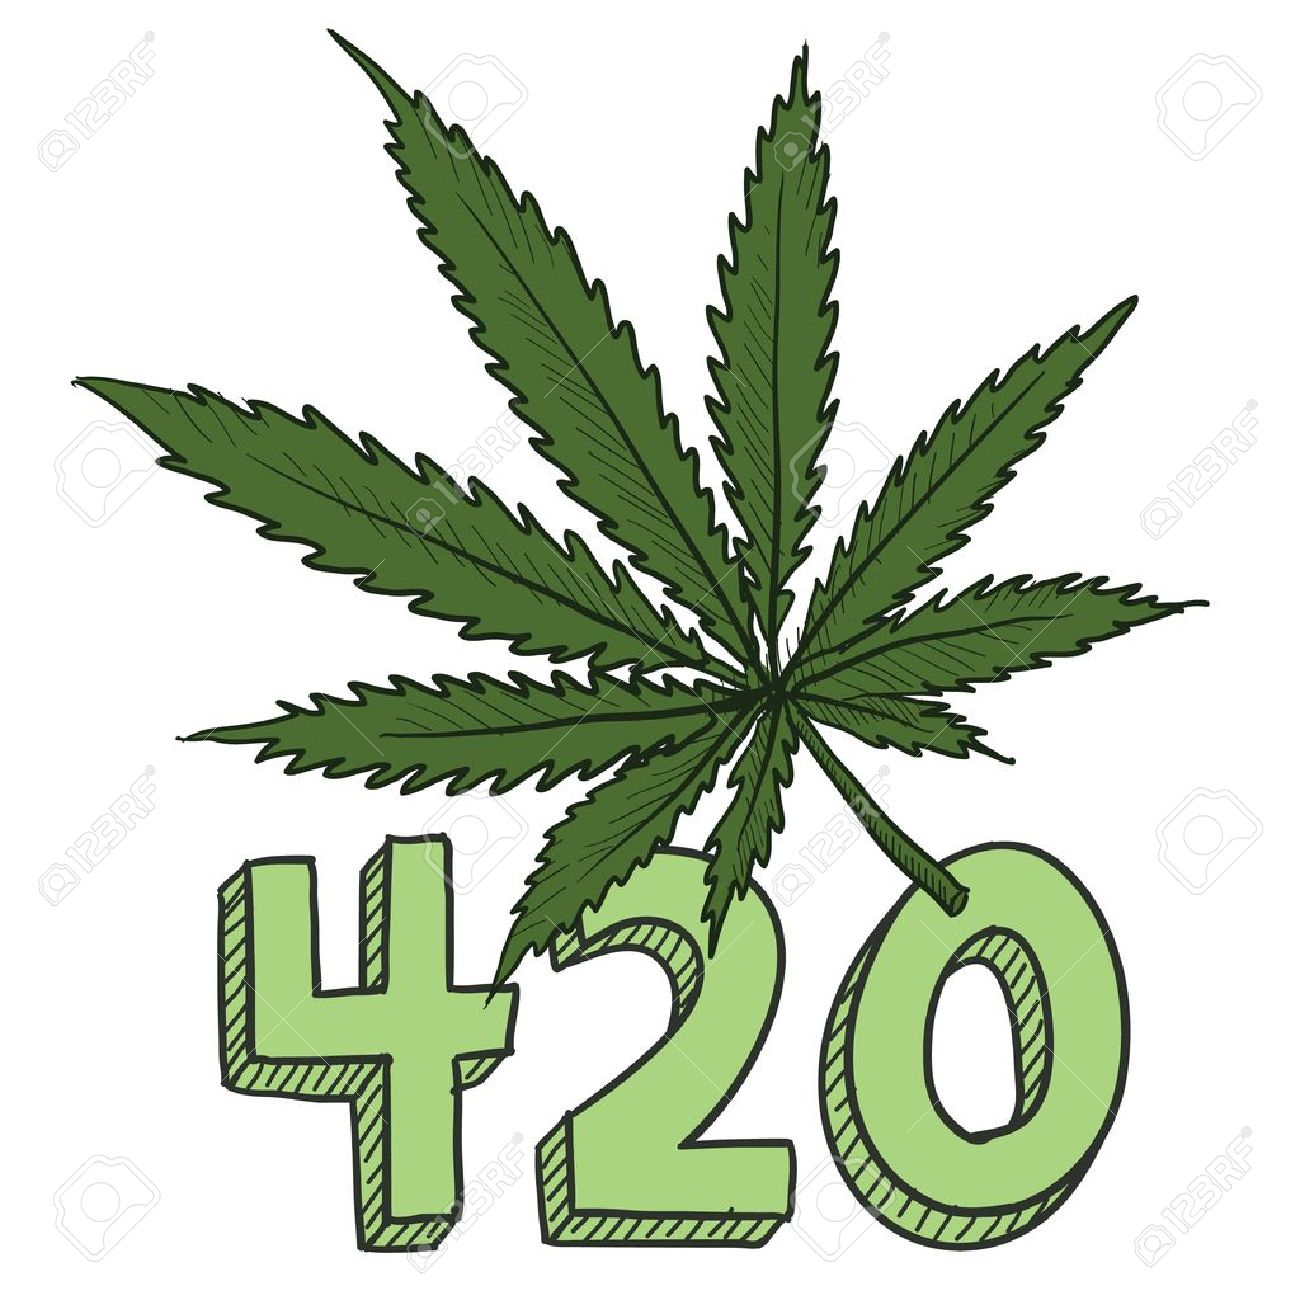 Doodle style 420 marijuana leaf sketch in vector format includes doodle style 420 marijuana leaf sketch in vector format includes text and pot plant stock vector biocorpaavc